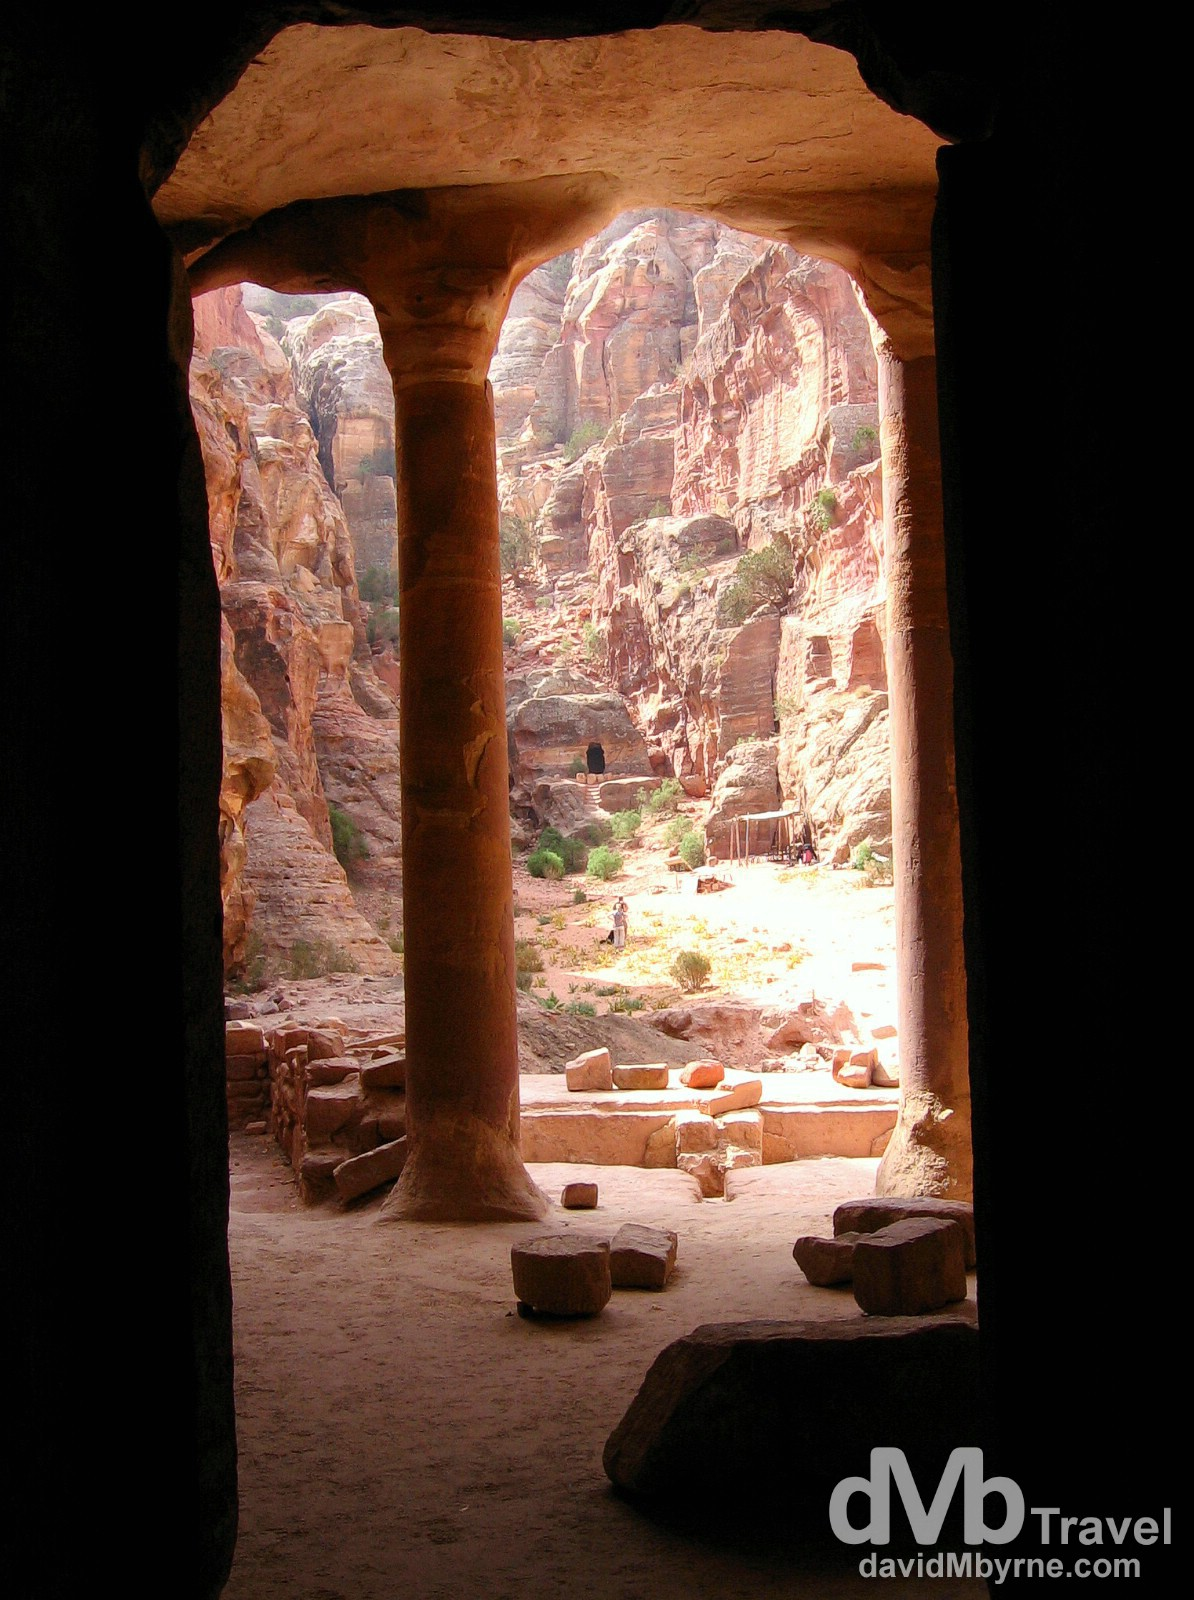 An abandoned building in Petra, Jordan. April 27, 2008.